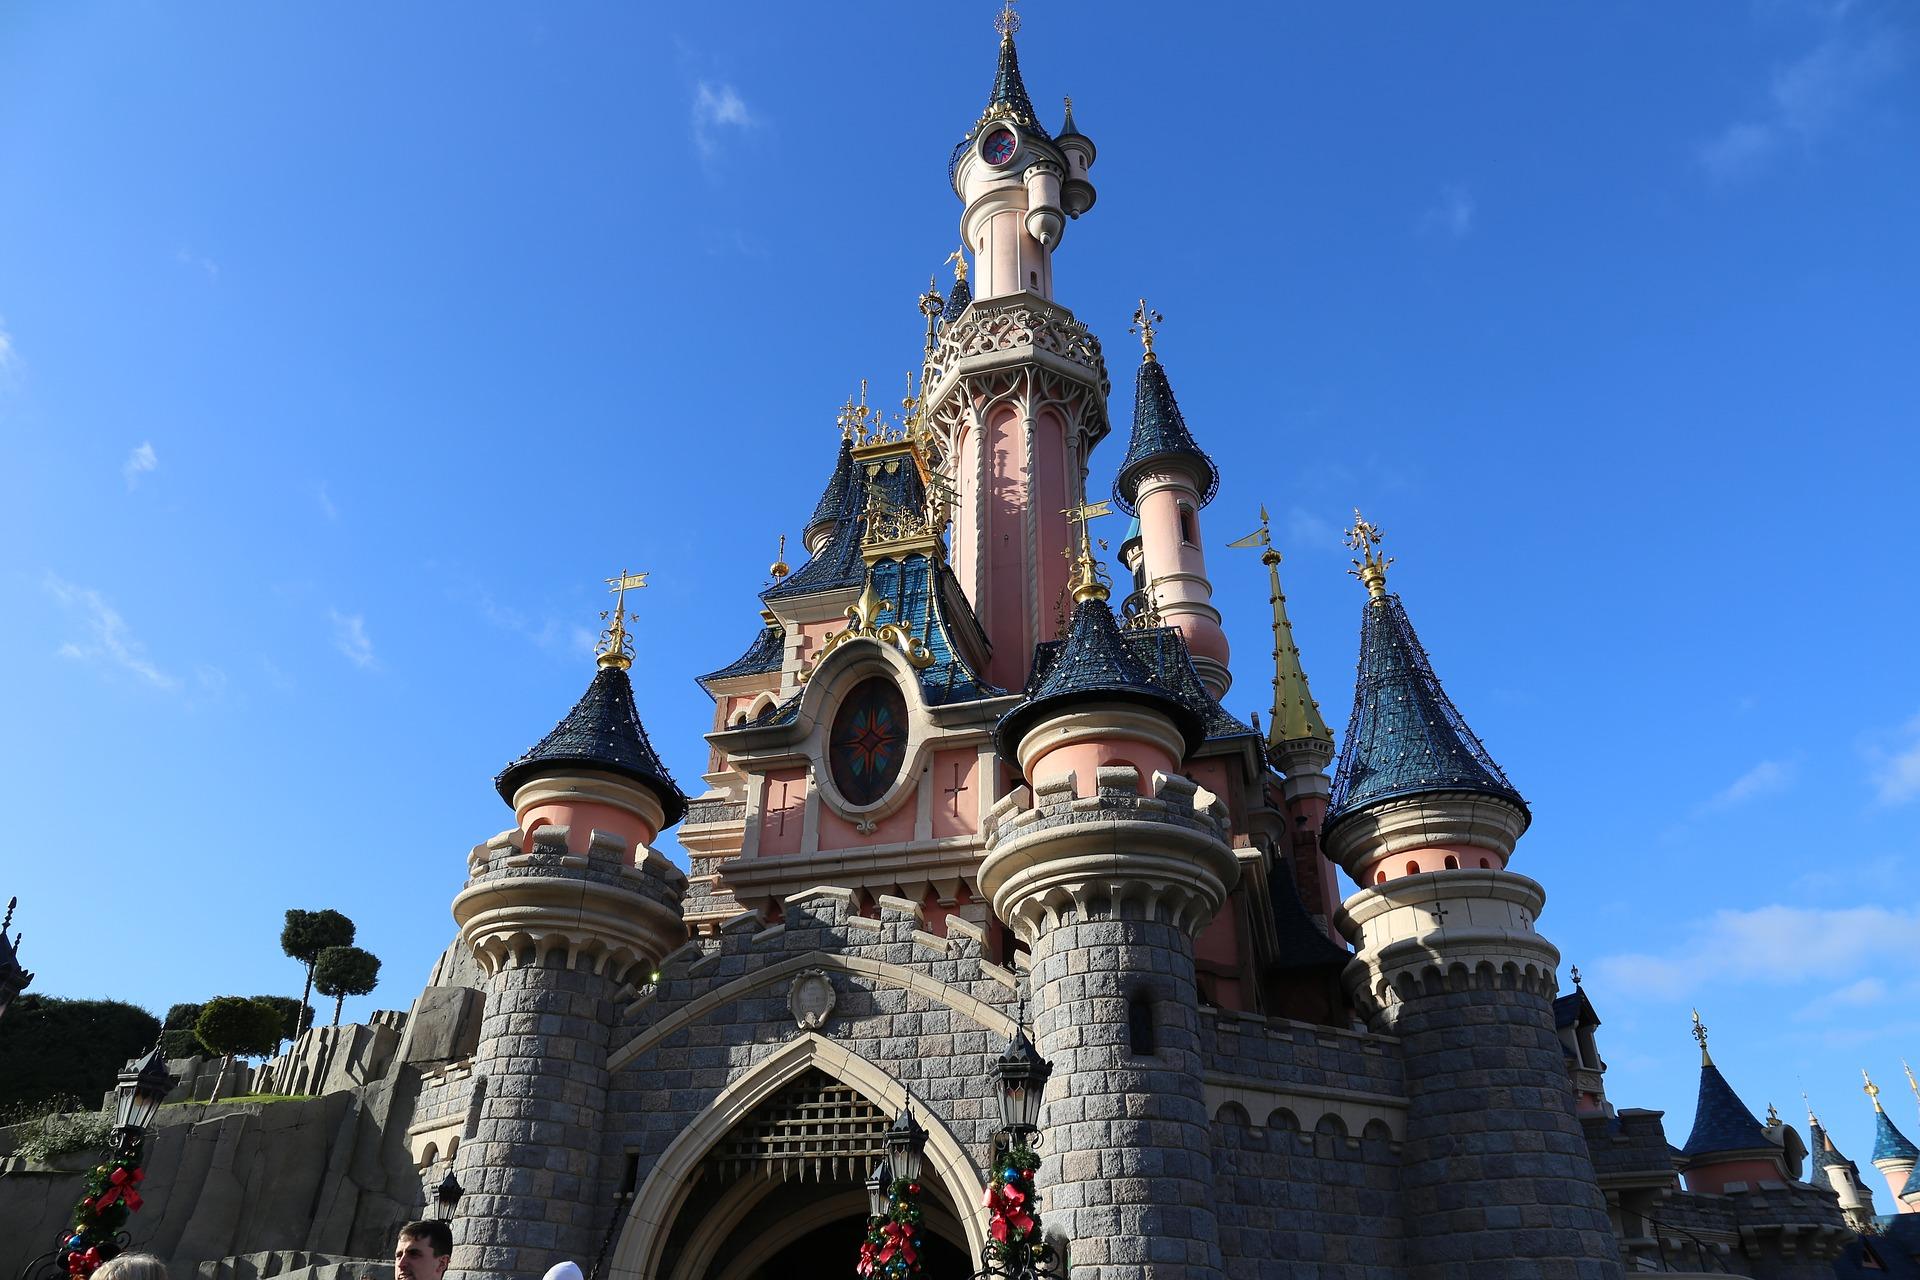 Disneyland Paris (Image: Courtesy of Disneyland Paris)